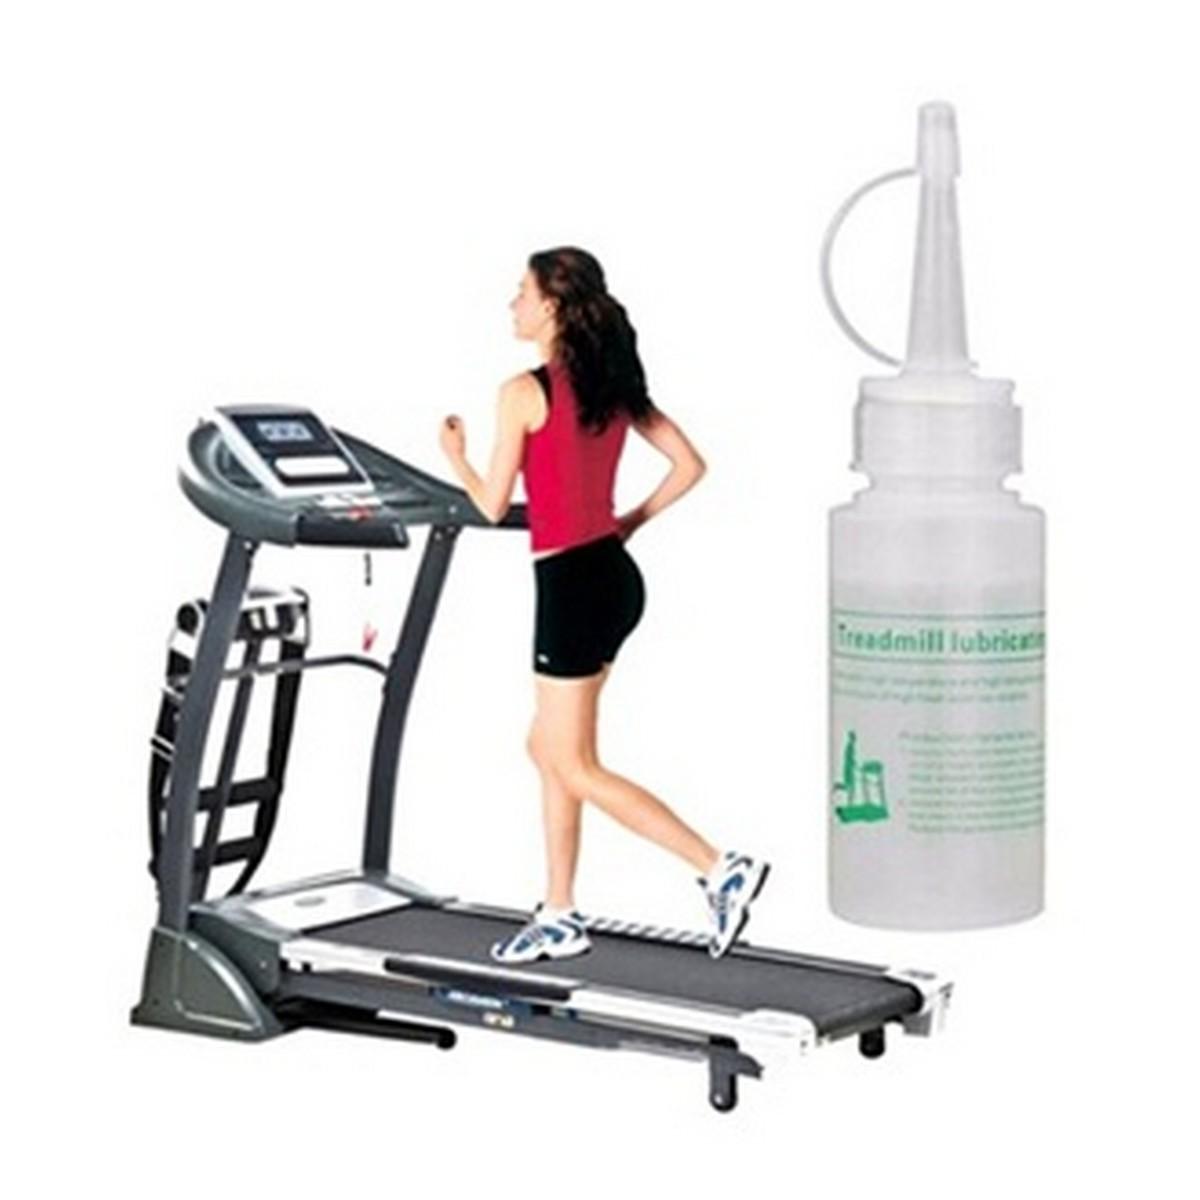 Treadmill Lubricating Oil- 250ml